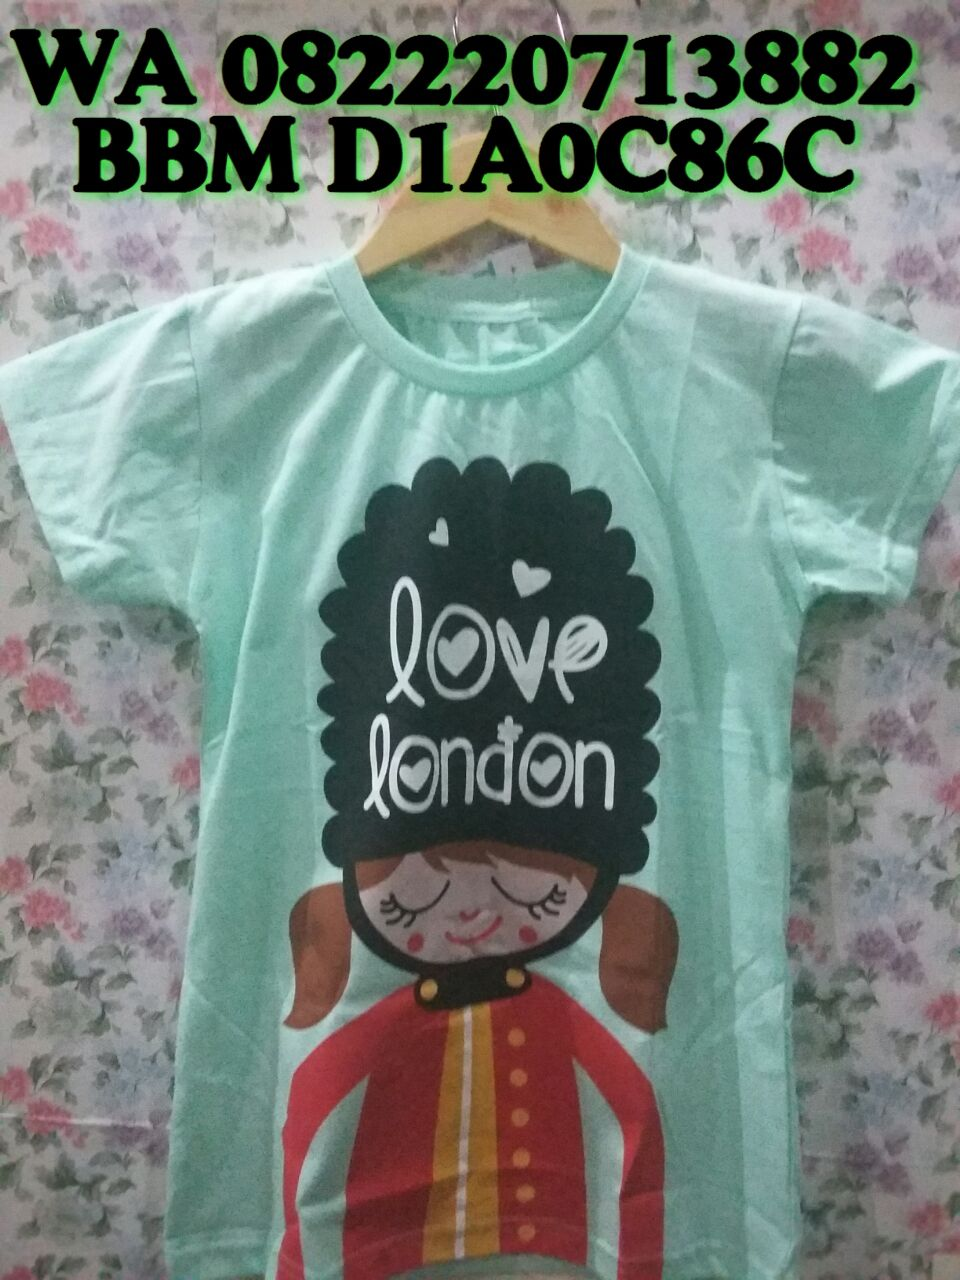 Kaos Baju Anak Bayi Laki Perempuan Murah Lucu Bagus Branded 1 2